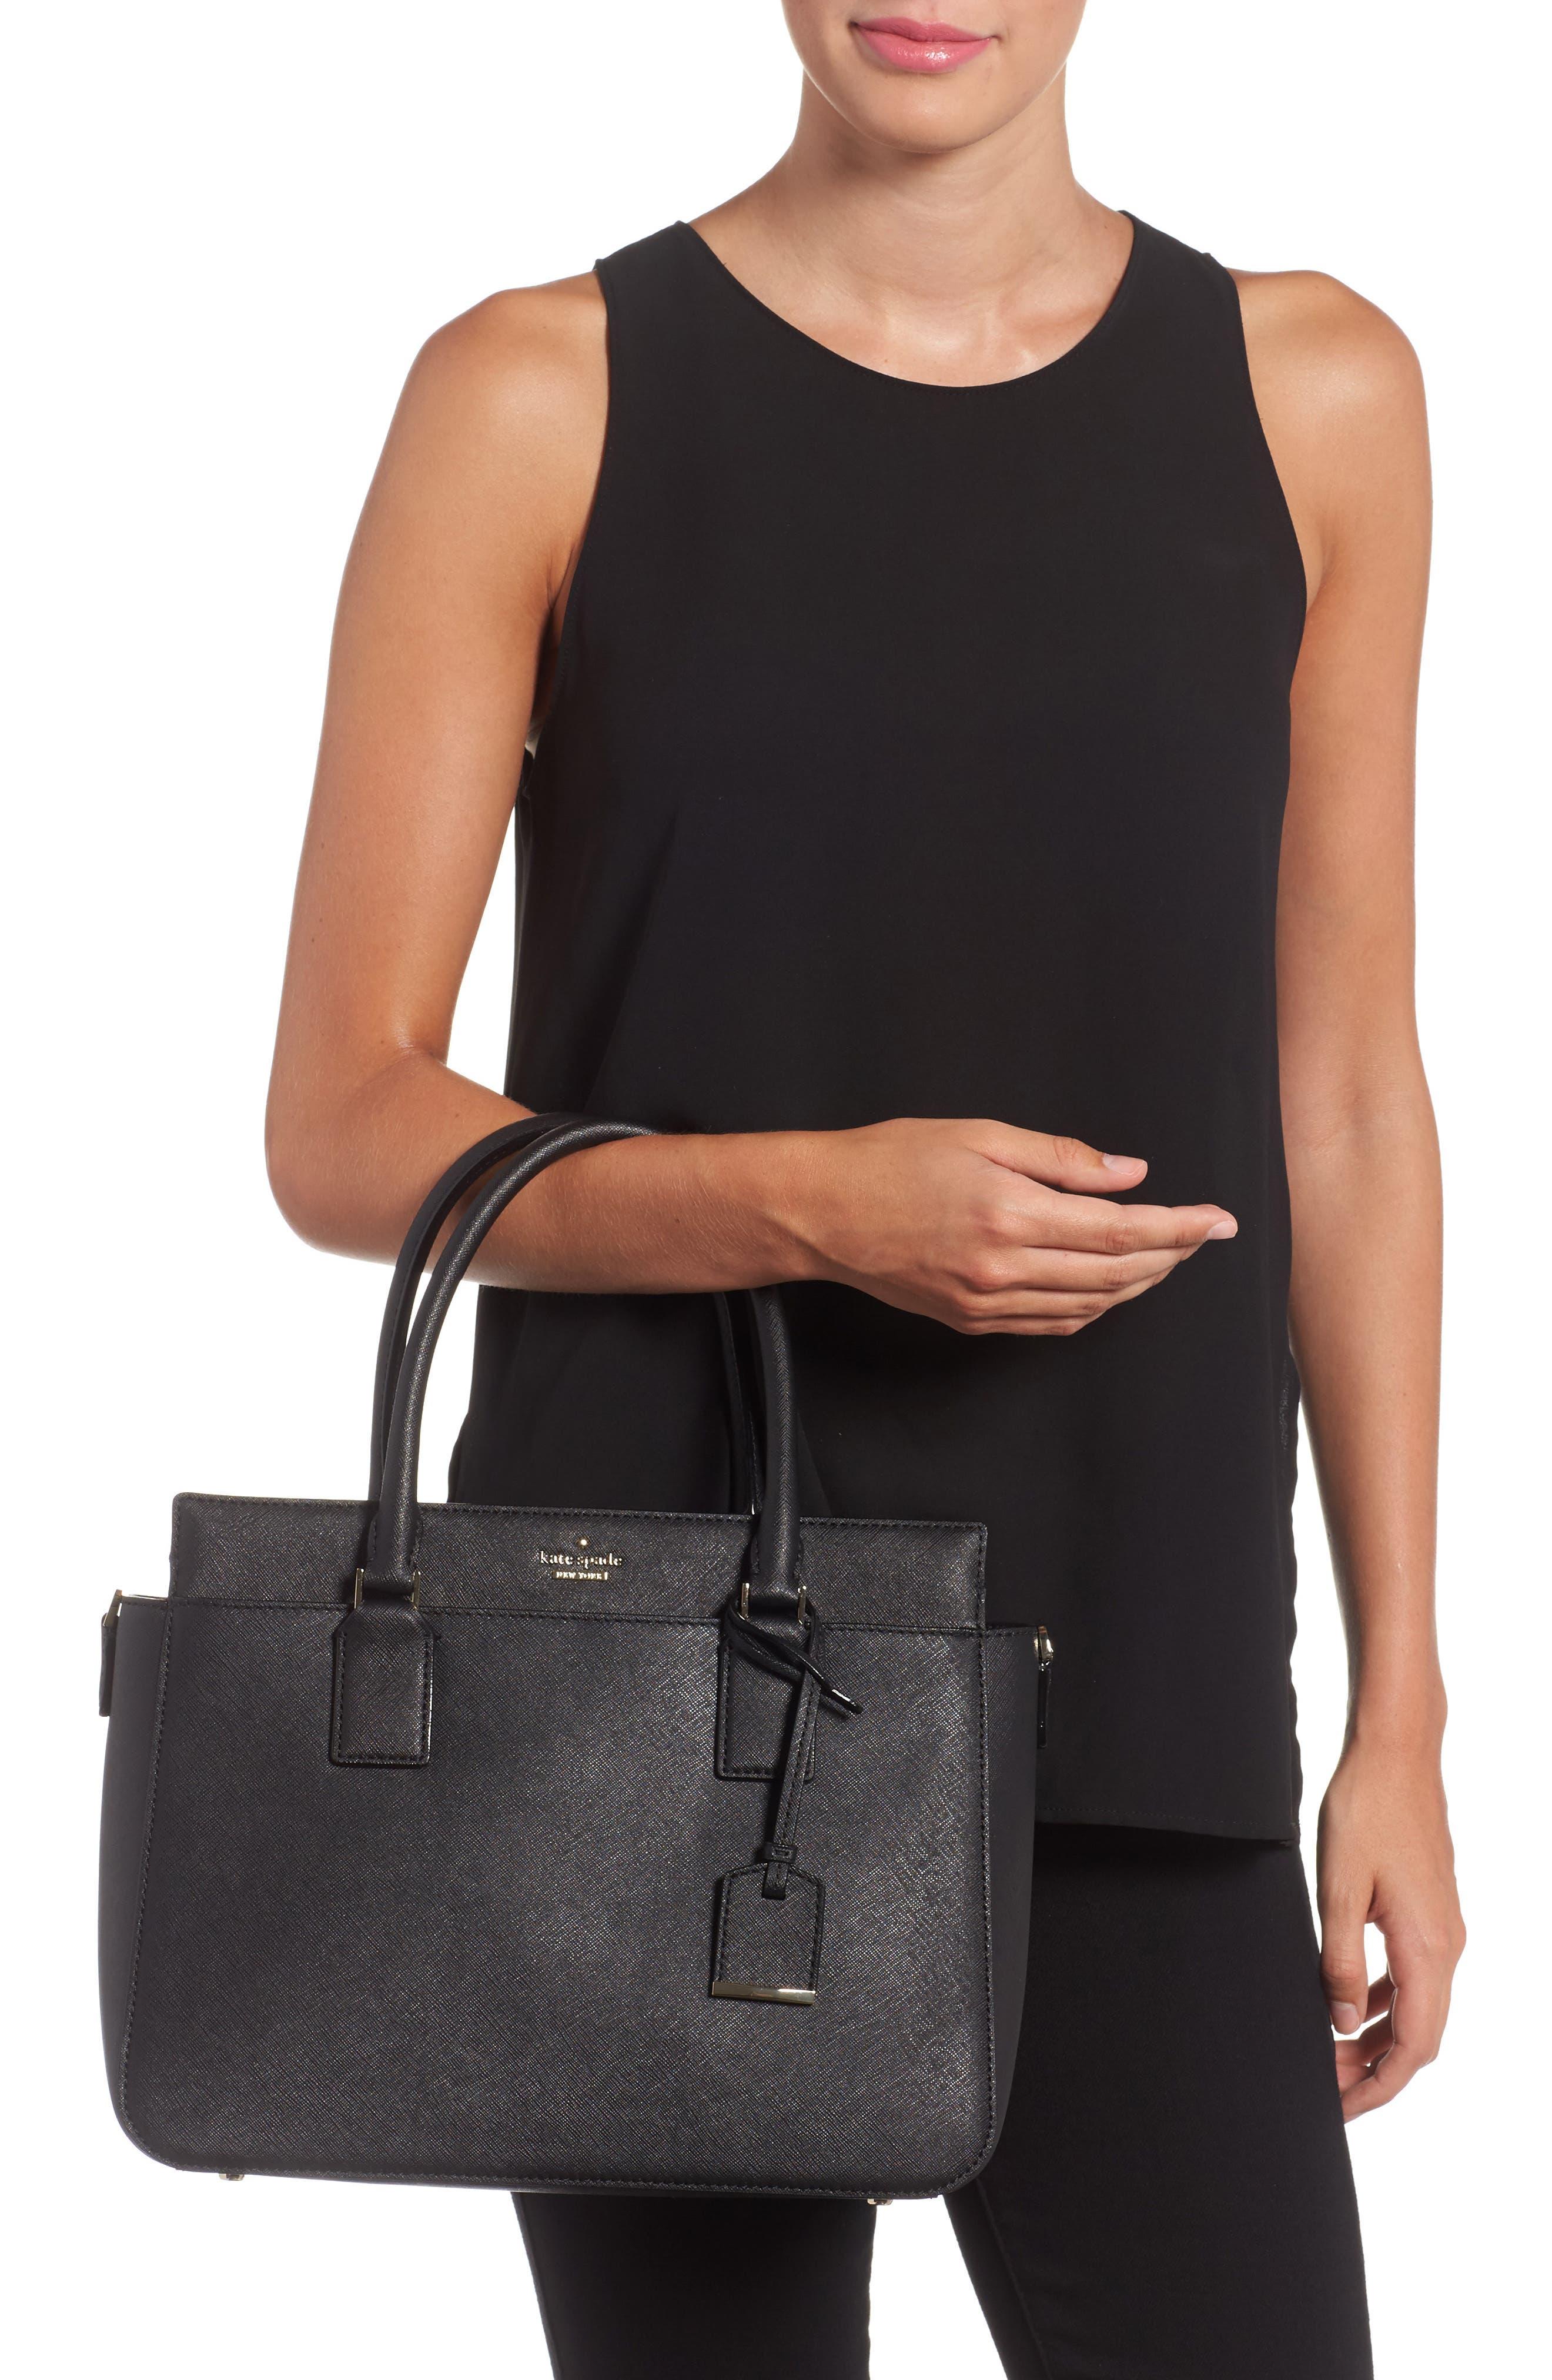 cameron street - sally leather satchel,                             Alternate thumbnail 2, color,                             001